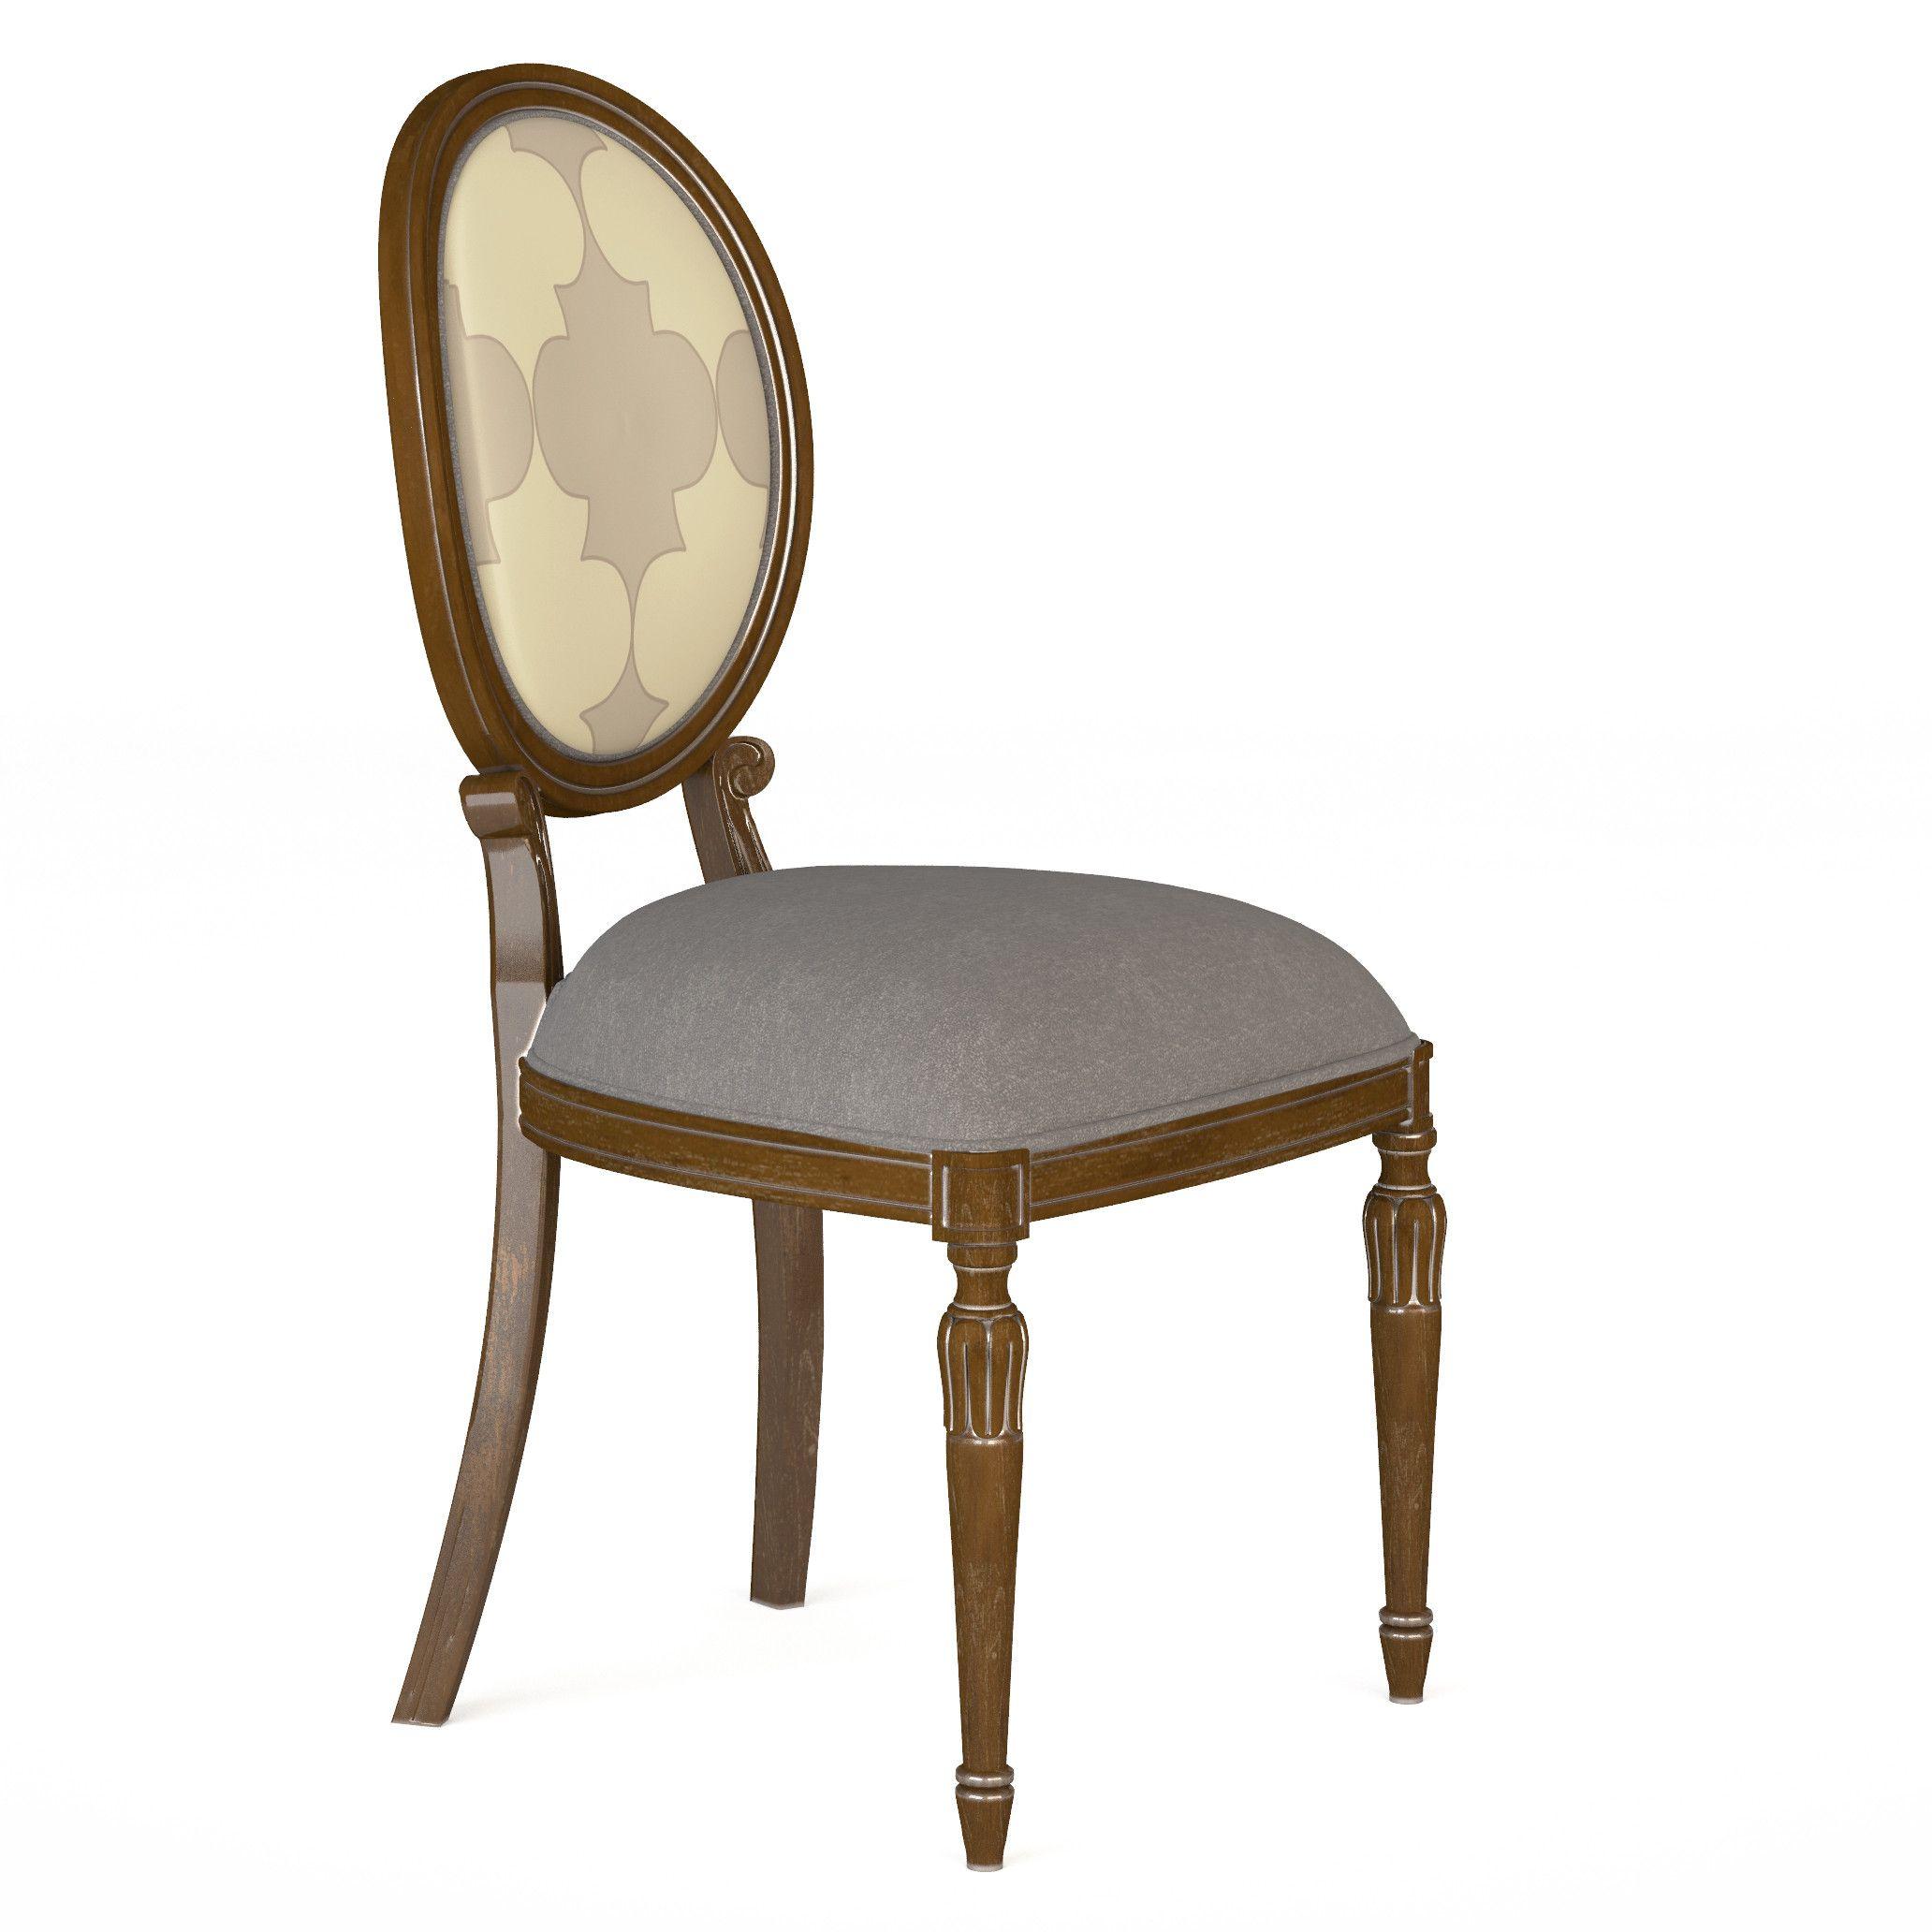 3D max chair furniture carved Krzesło model 3d spisestol 3d modell pranzo sedia modello 3D